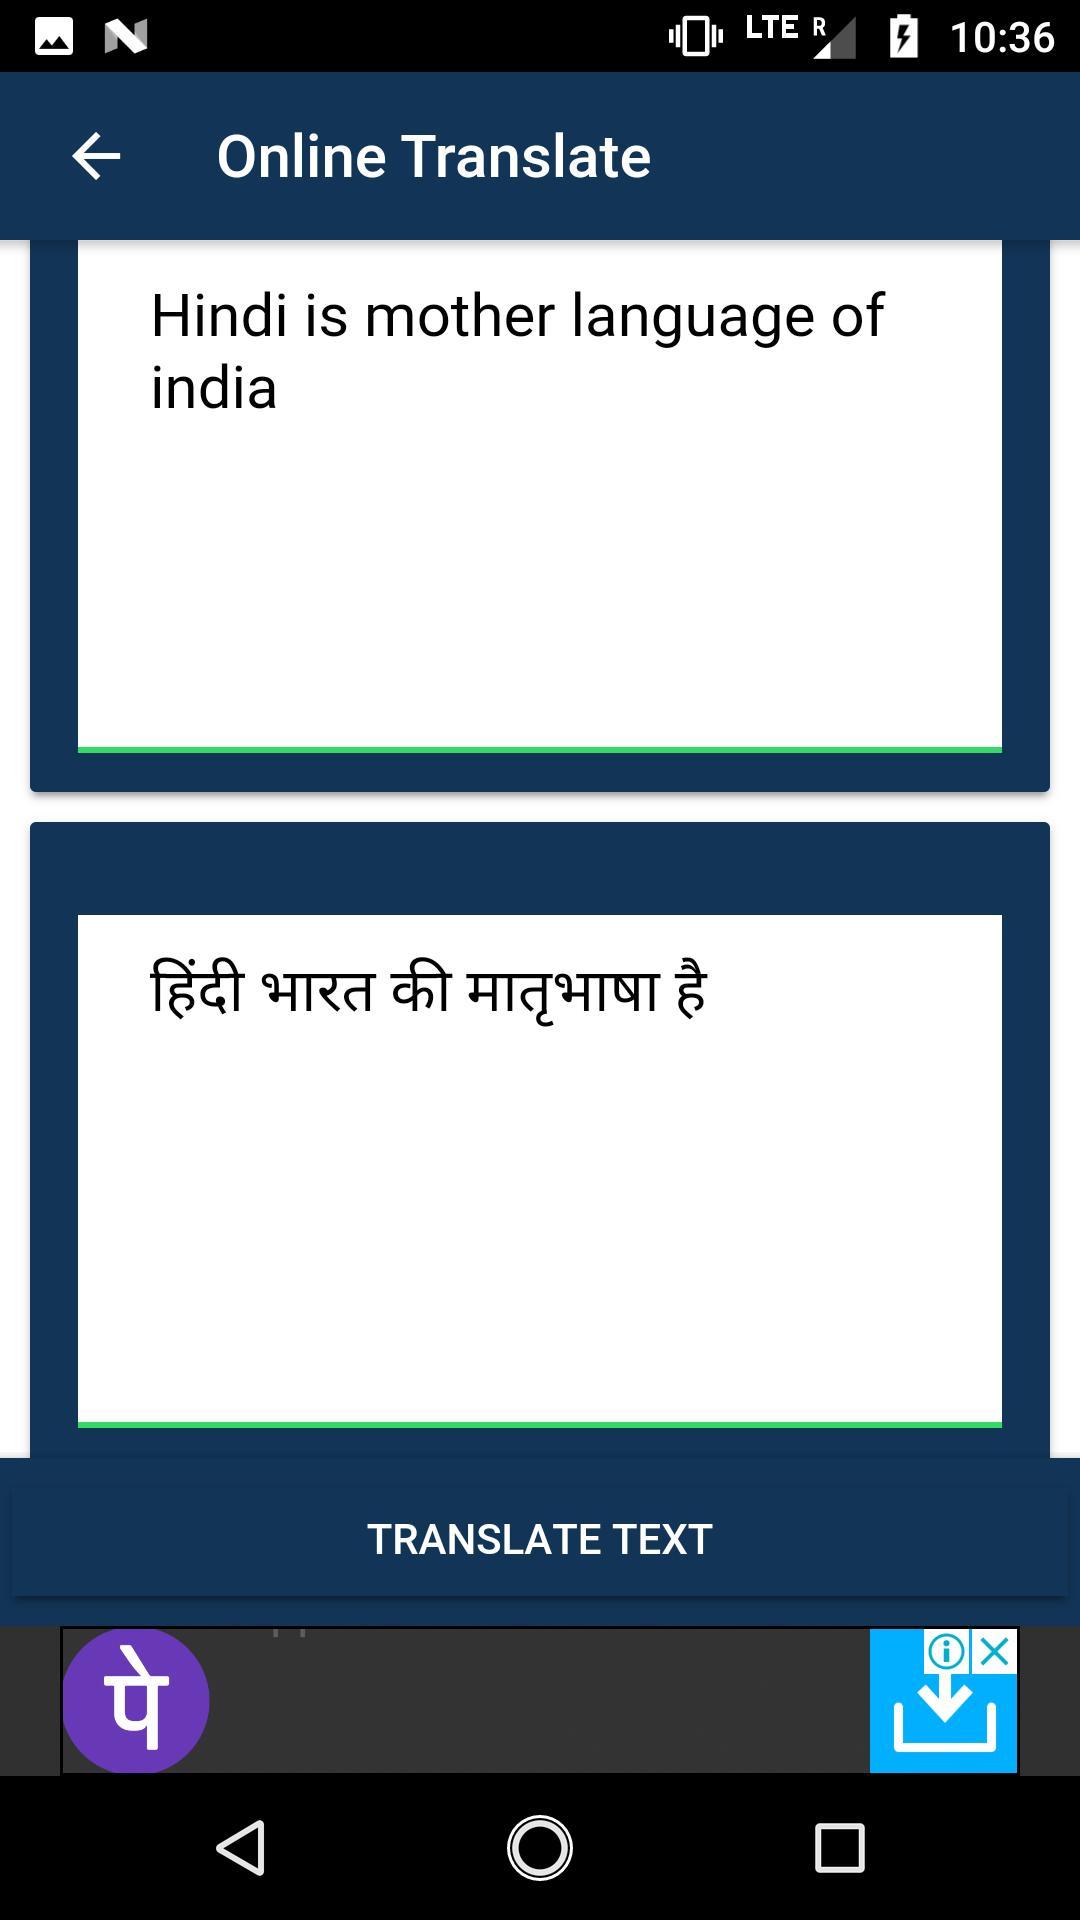 English hindi translate in words to english Online Hindi